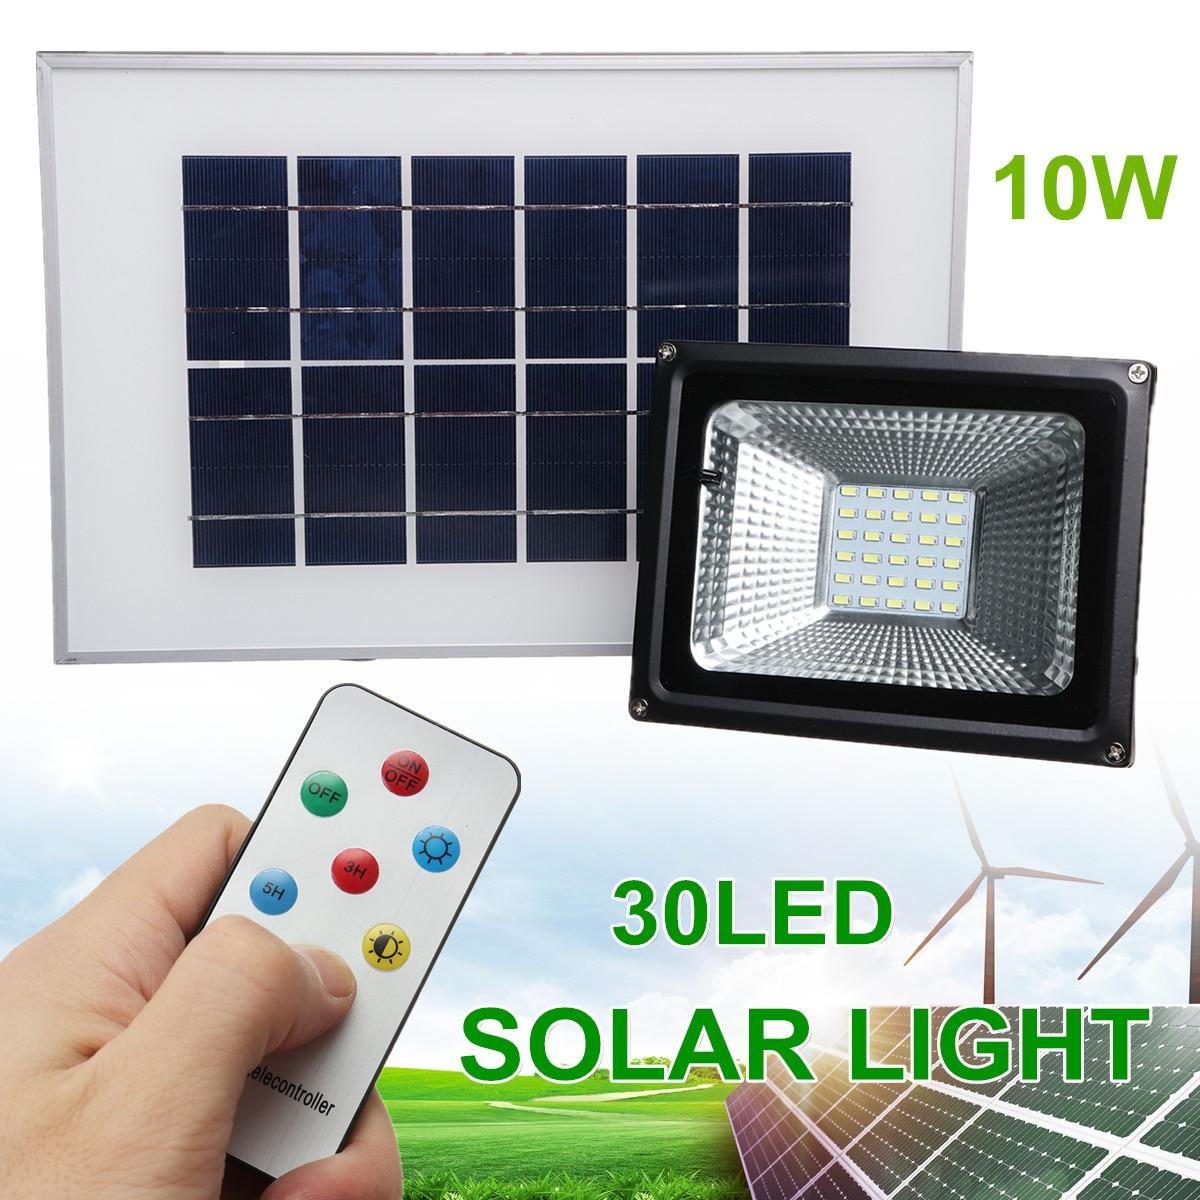 Garden Lawn Lighting Lamp Remote Control Outdoor 30 LED Solar Power Flood Light Reusable & Super Bright Intelligent Sunlight цена 2017